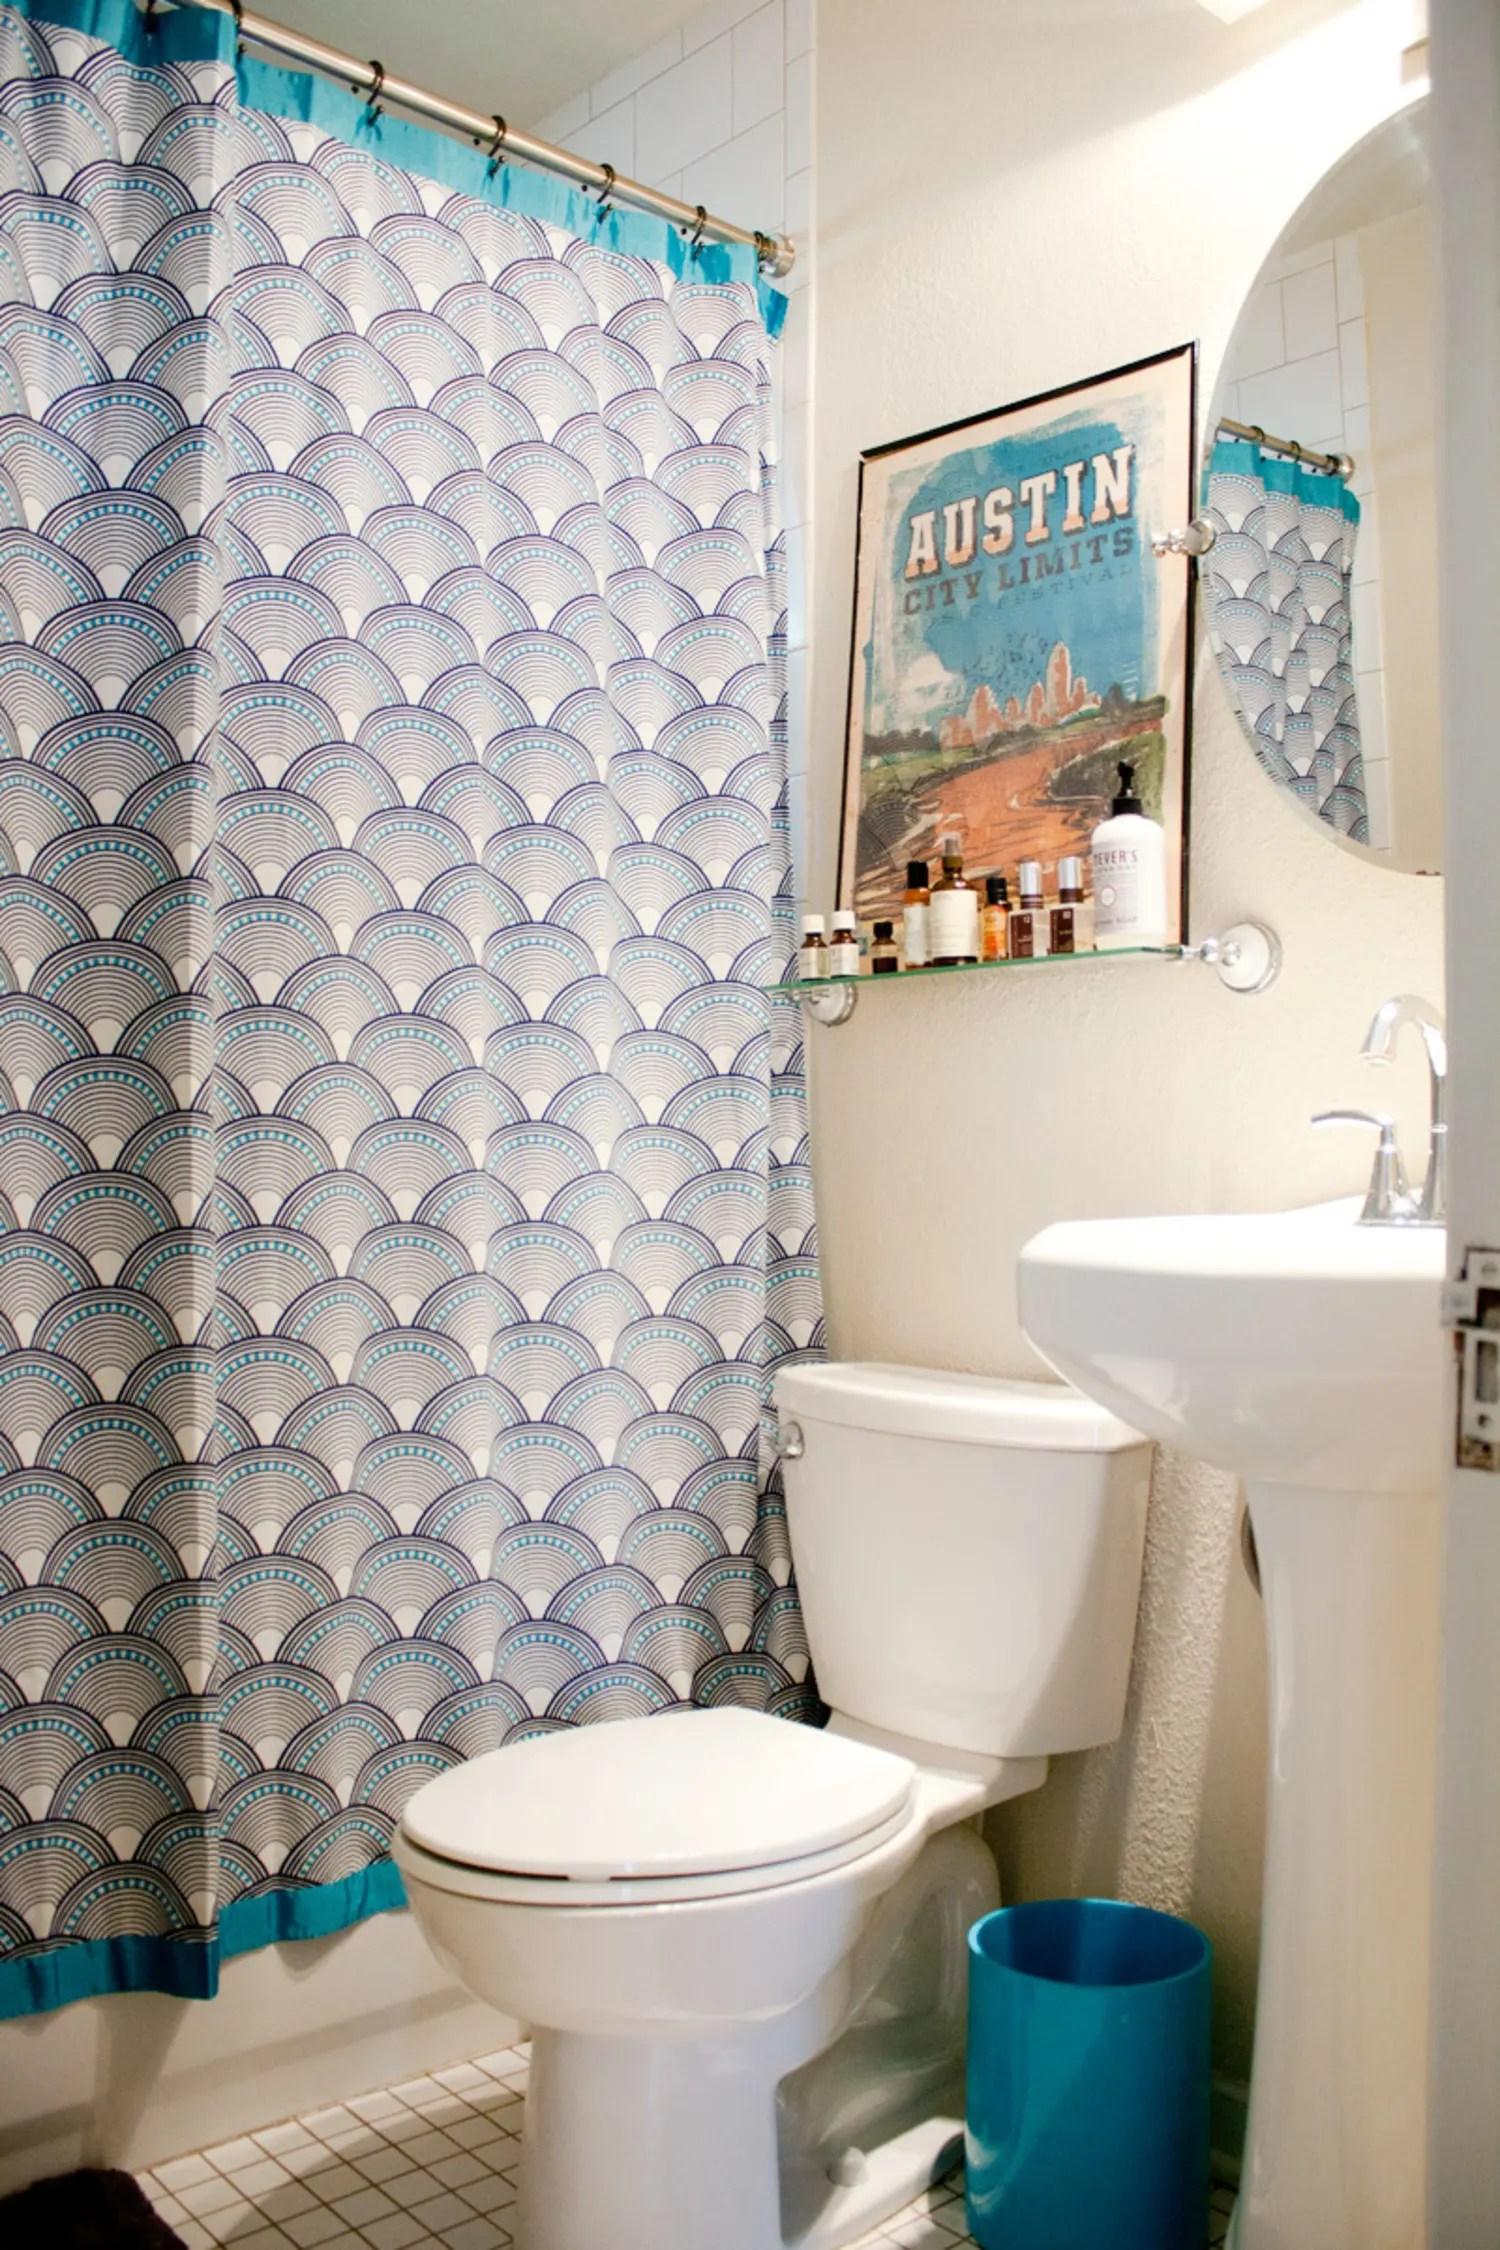 Small Bathroom Ideas: 6 Room Brightening Tips for Tiny ... on Small Apartment Bathroom Storage Ideas  id=18760